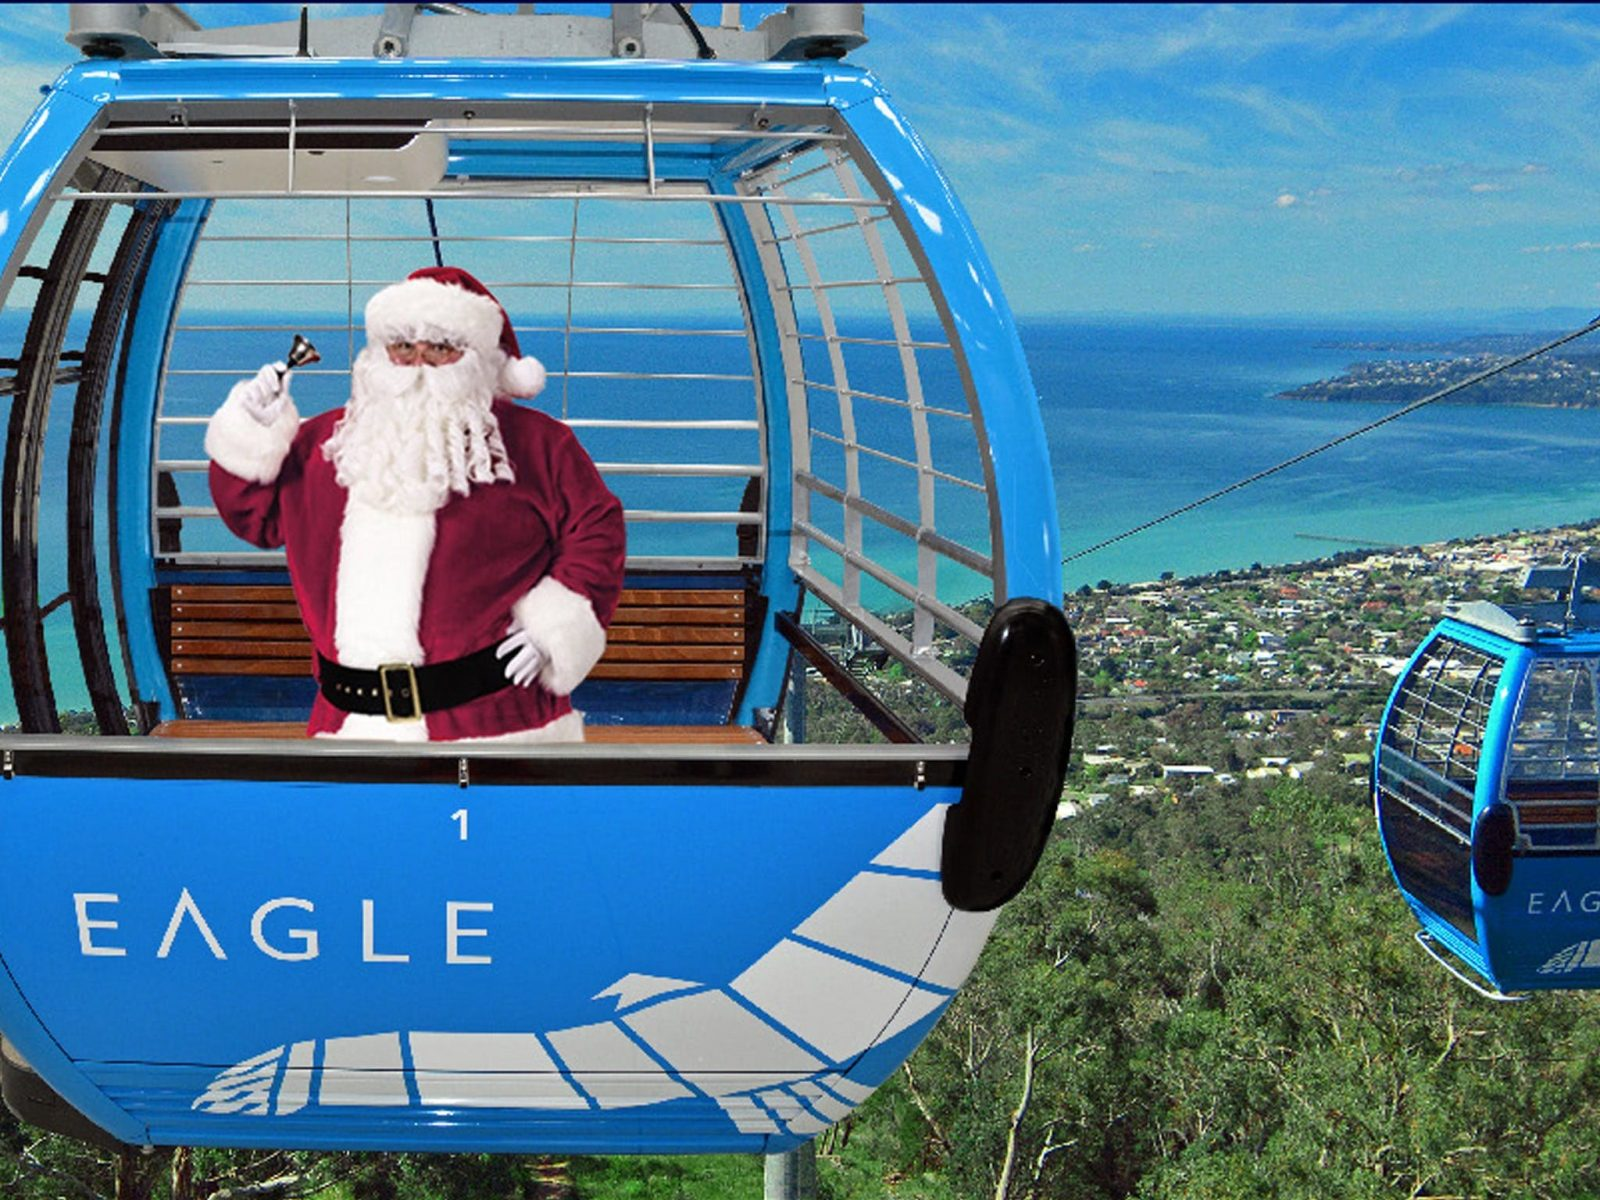 Santa in an Eagle Gondola